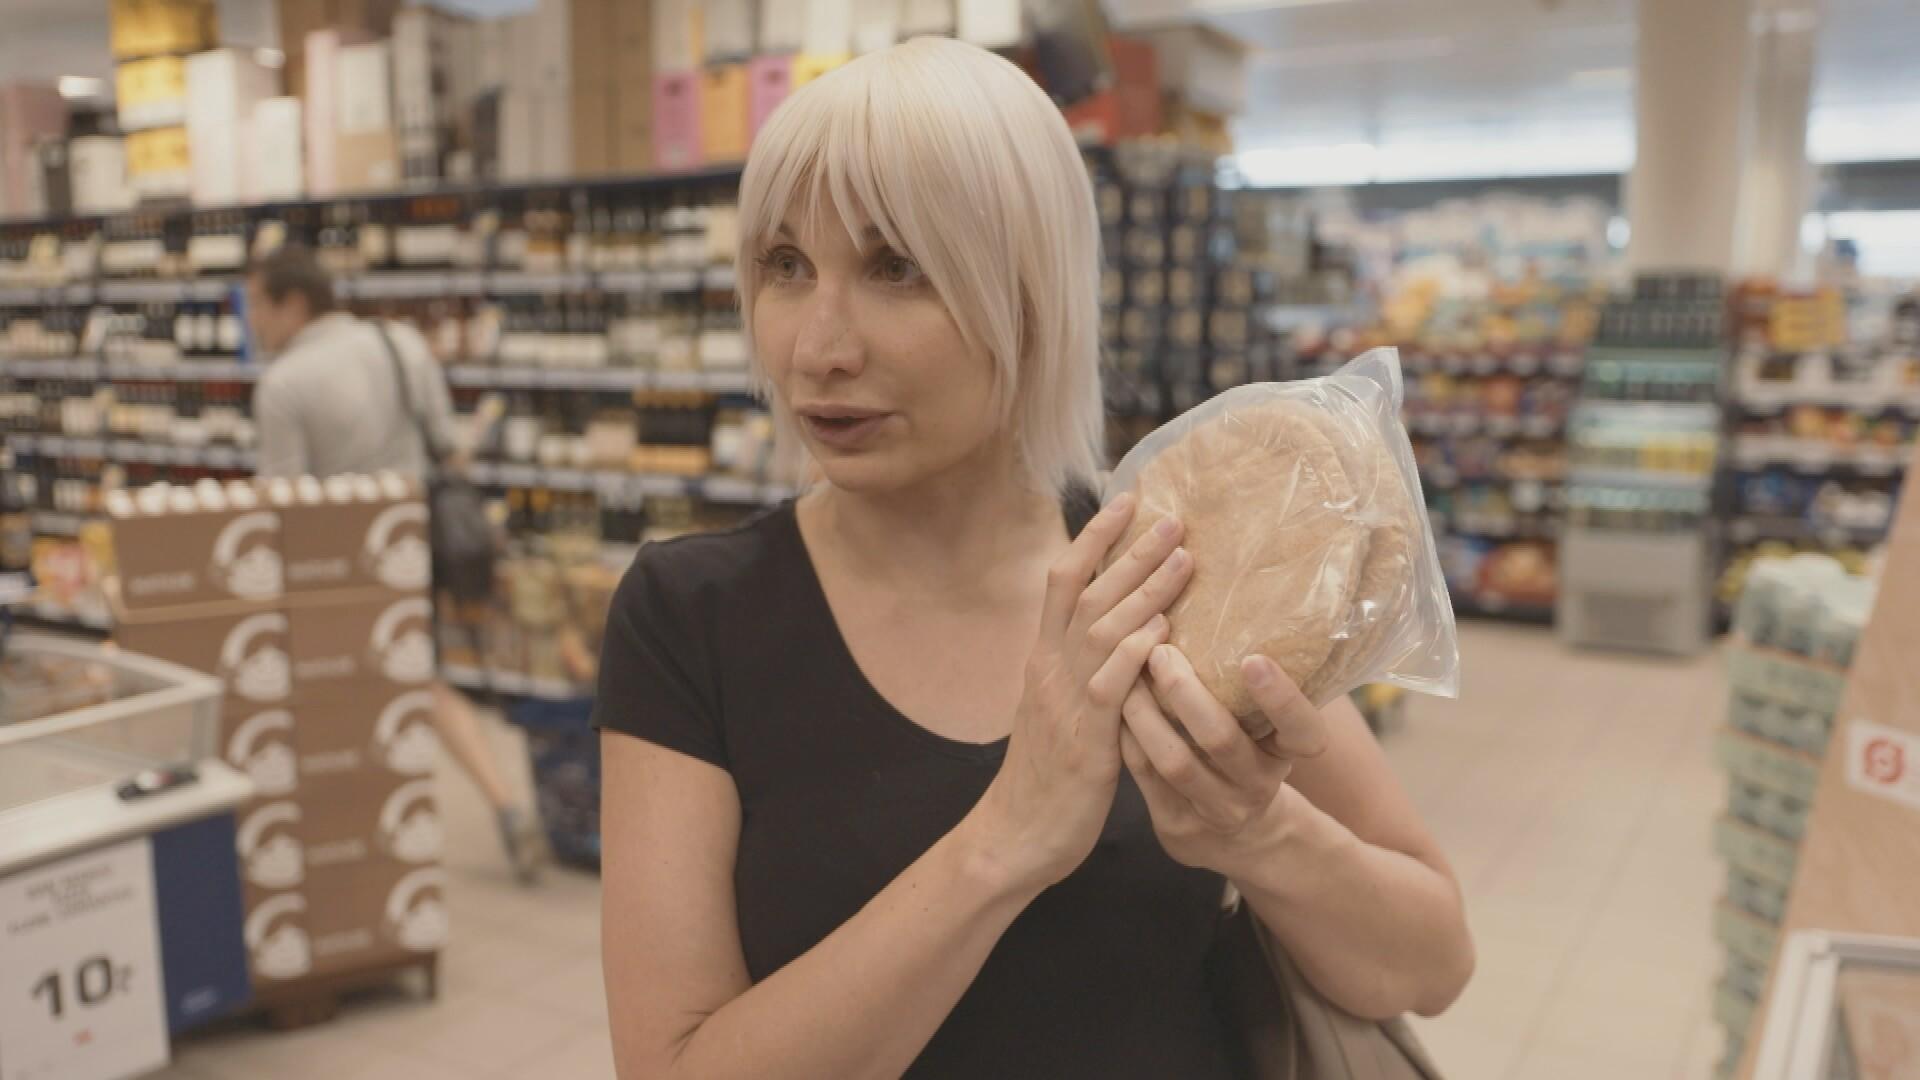 Rolmodel tegen de voedselverspilling